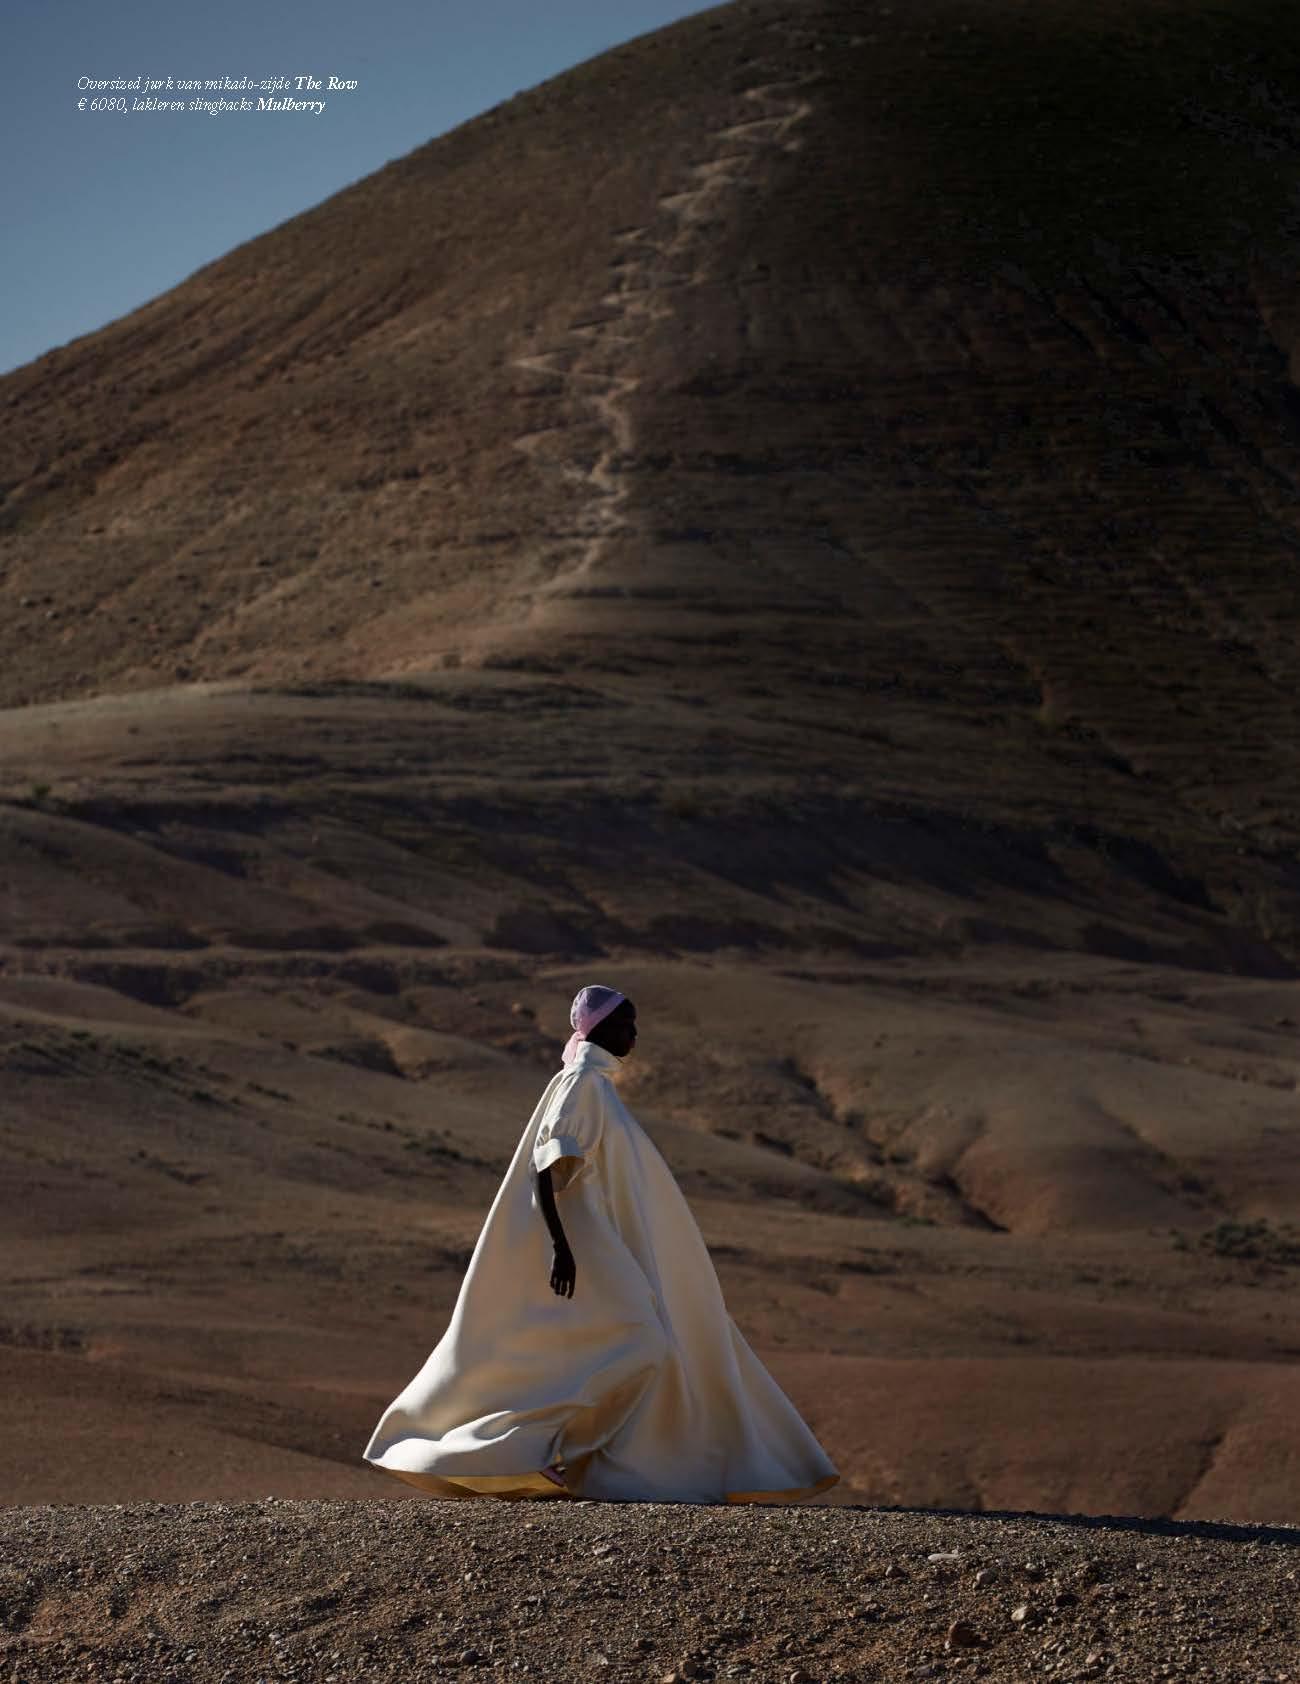 Niko Riam by Carlijn Jacobs for Vogue Netherlands (6).jpg